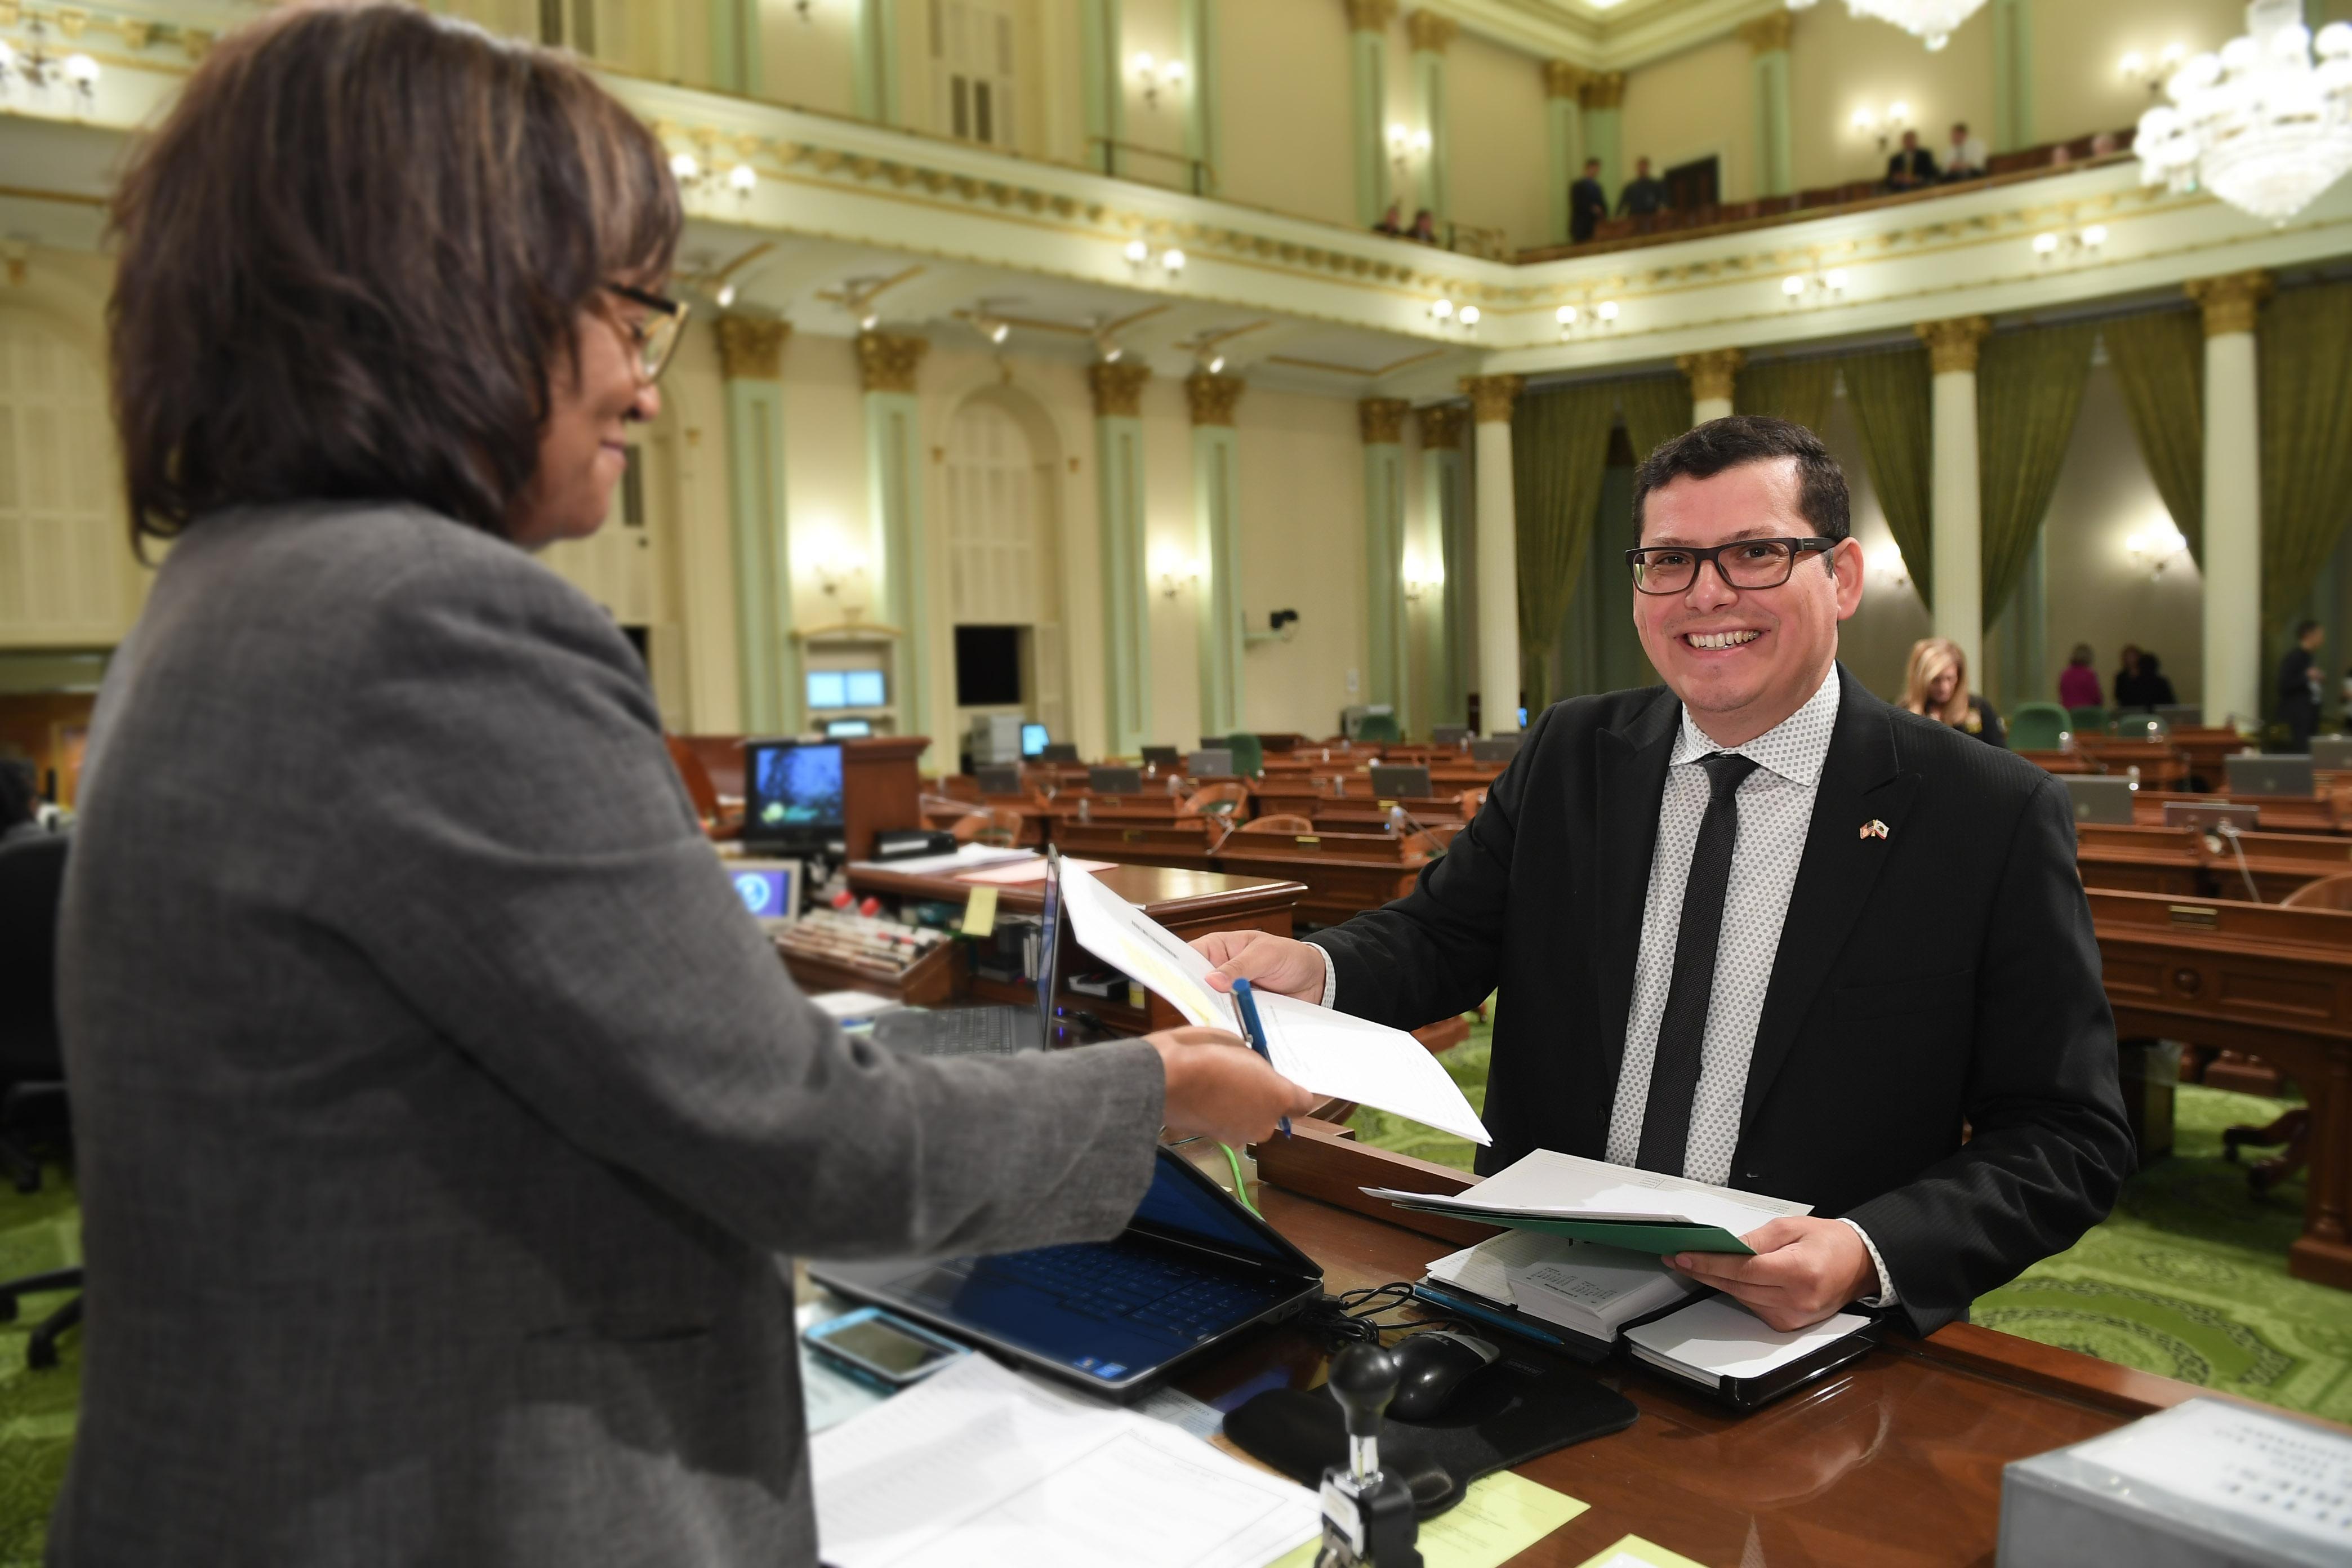 Assemblyman Salas introduces valley fever legislation